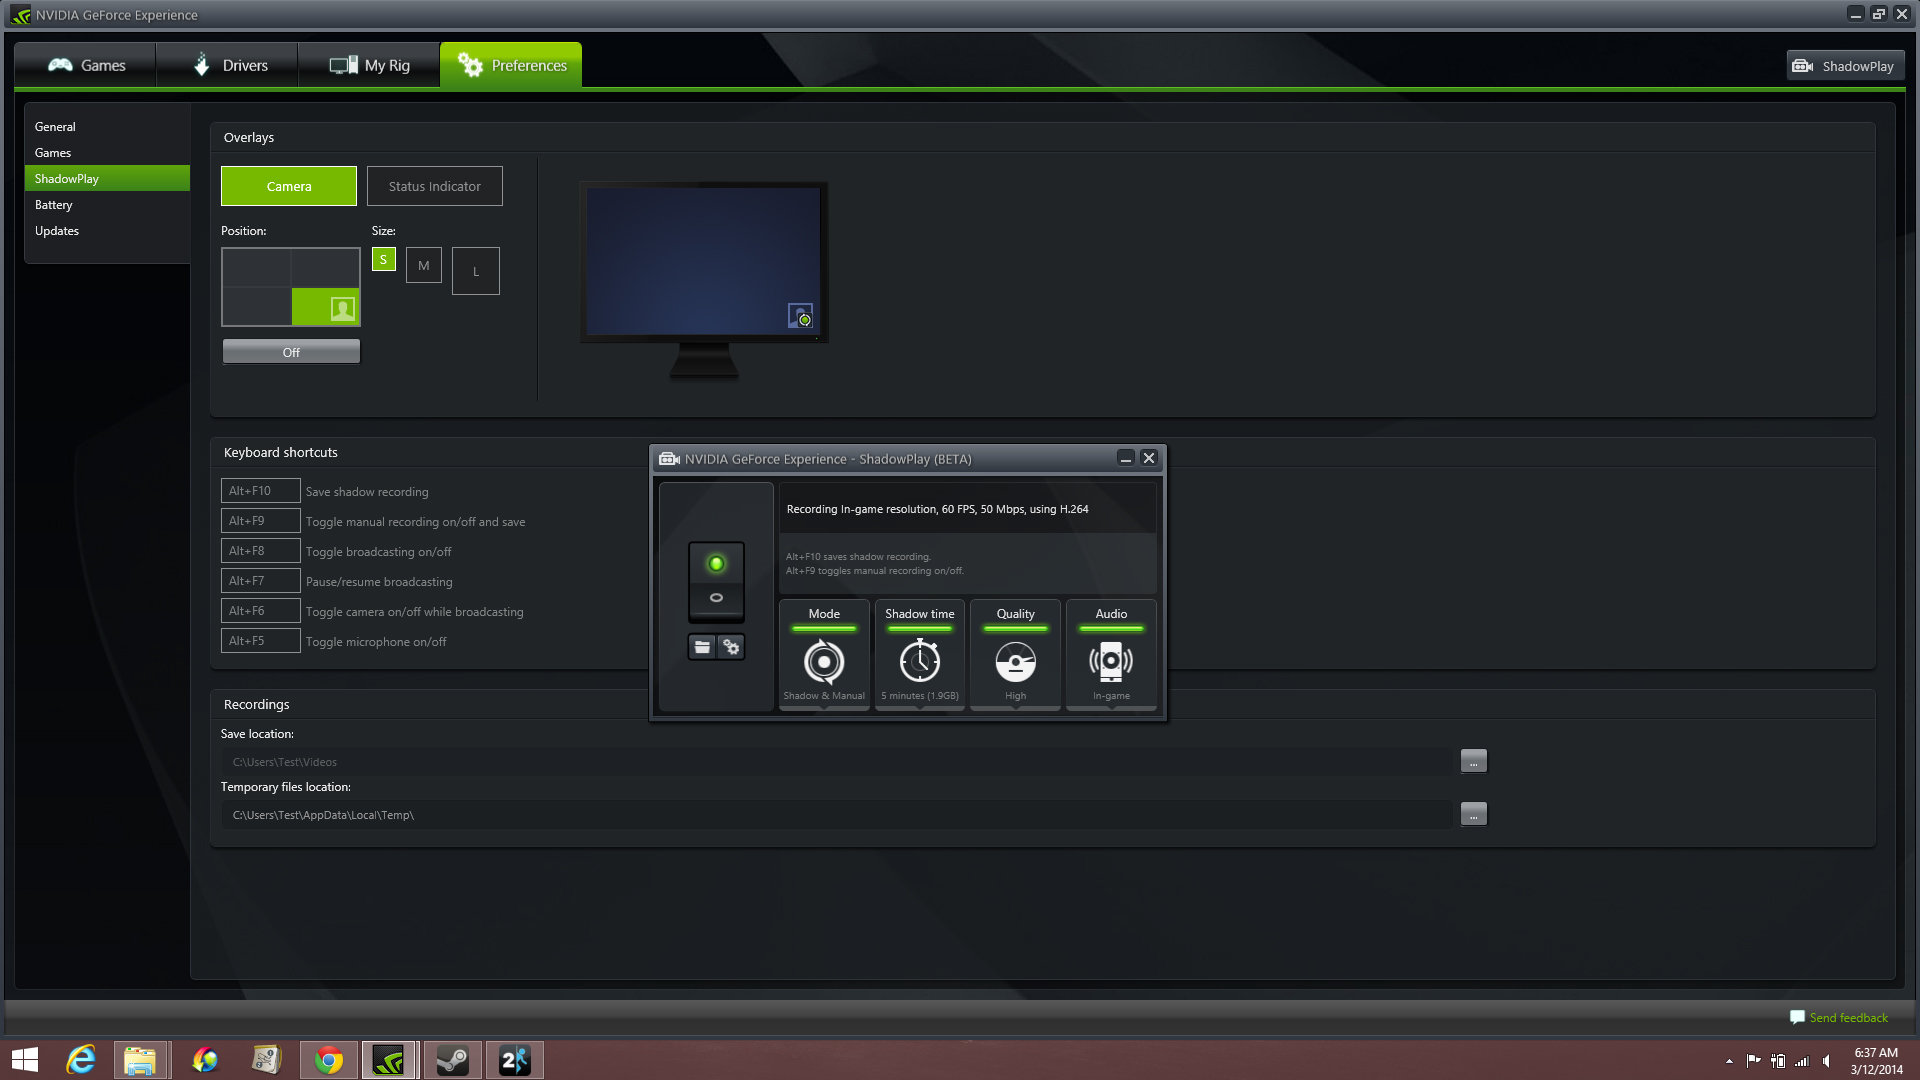 ShadowPlay, Nvidia's game-recording/broadcasting tool